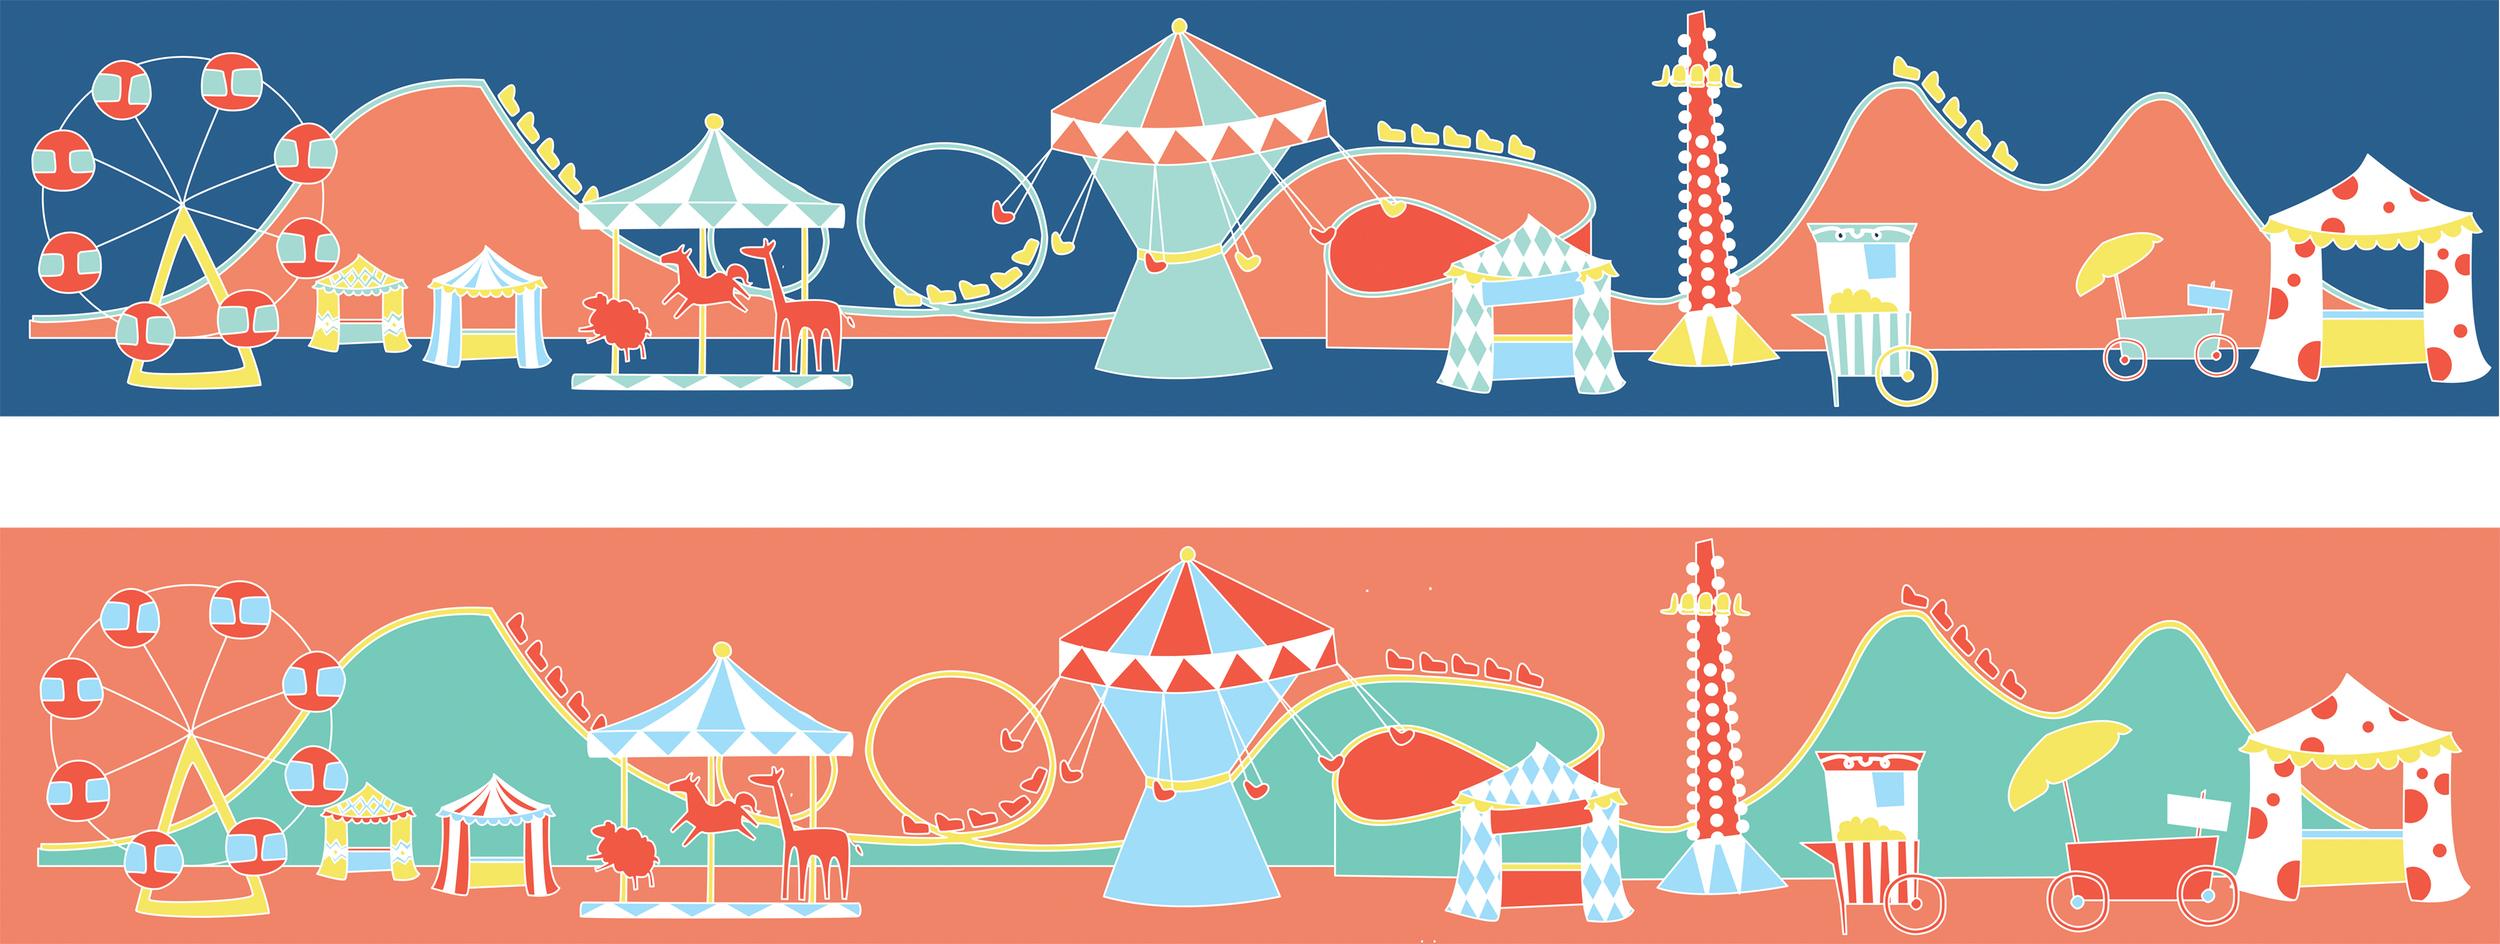 carnival skyline